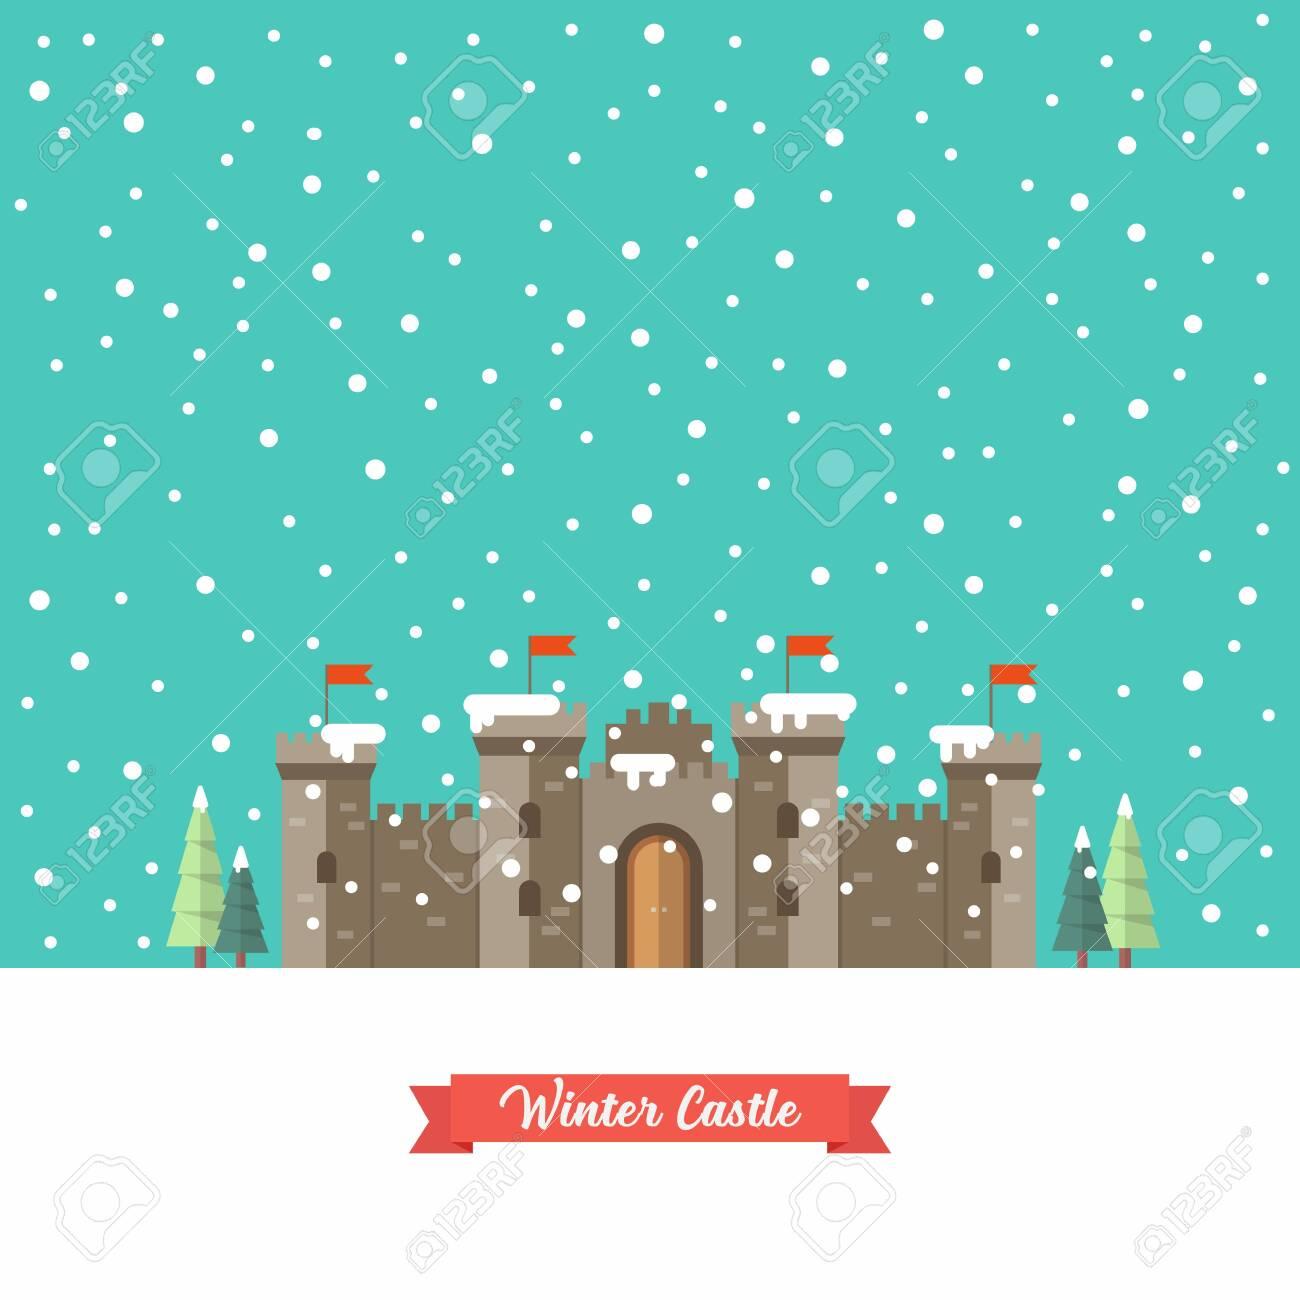 Castle in winter season. Vector illustration - 154448842